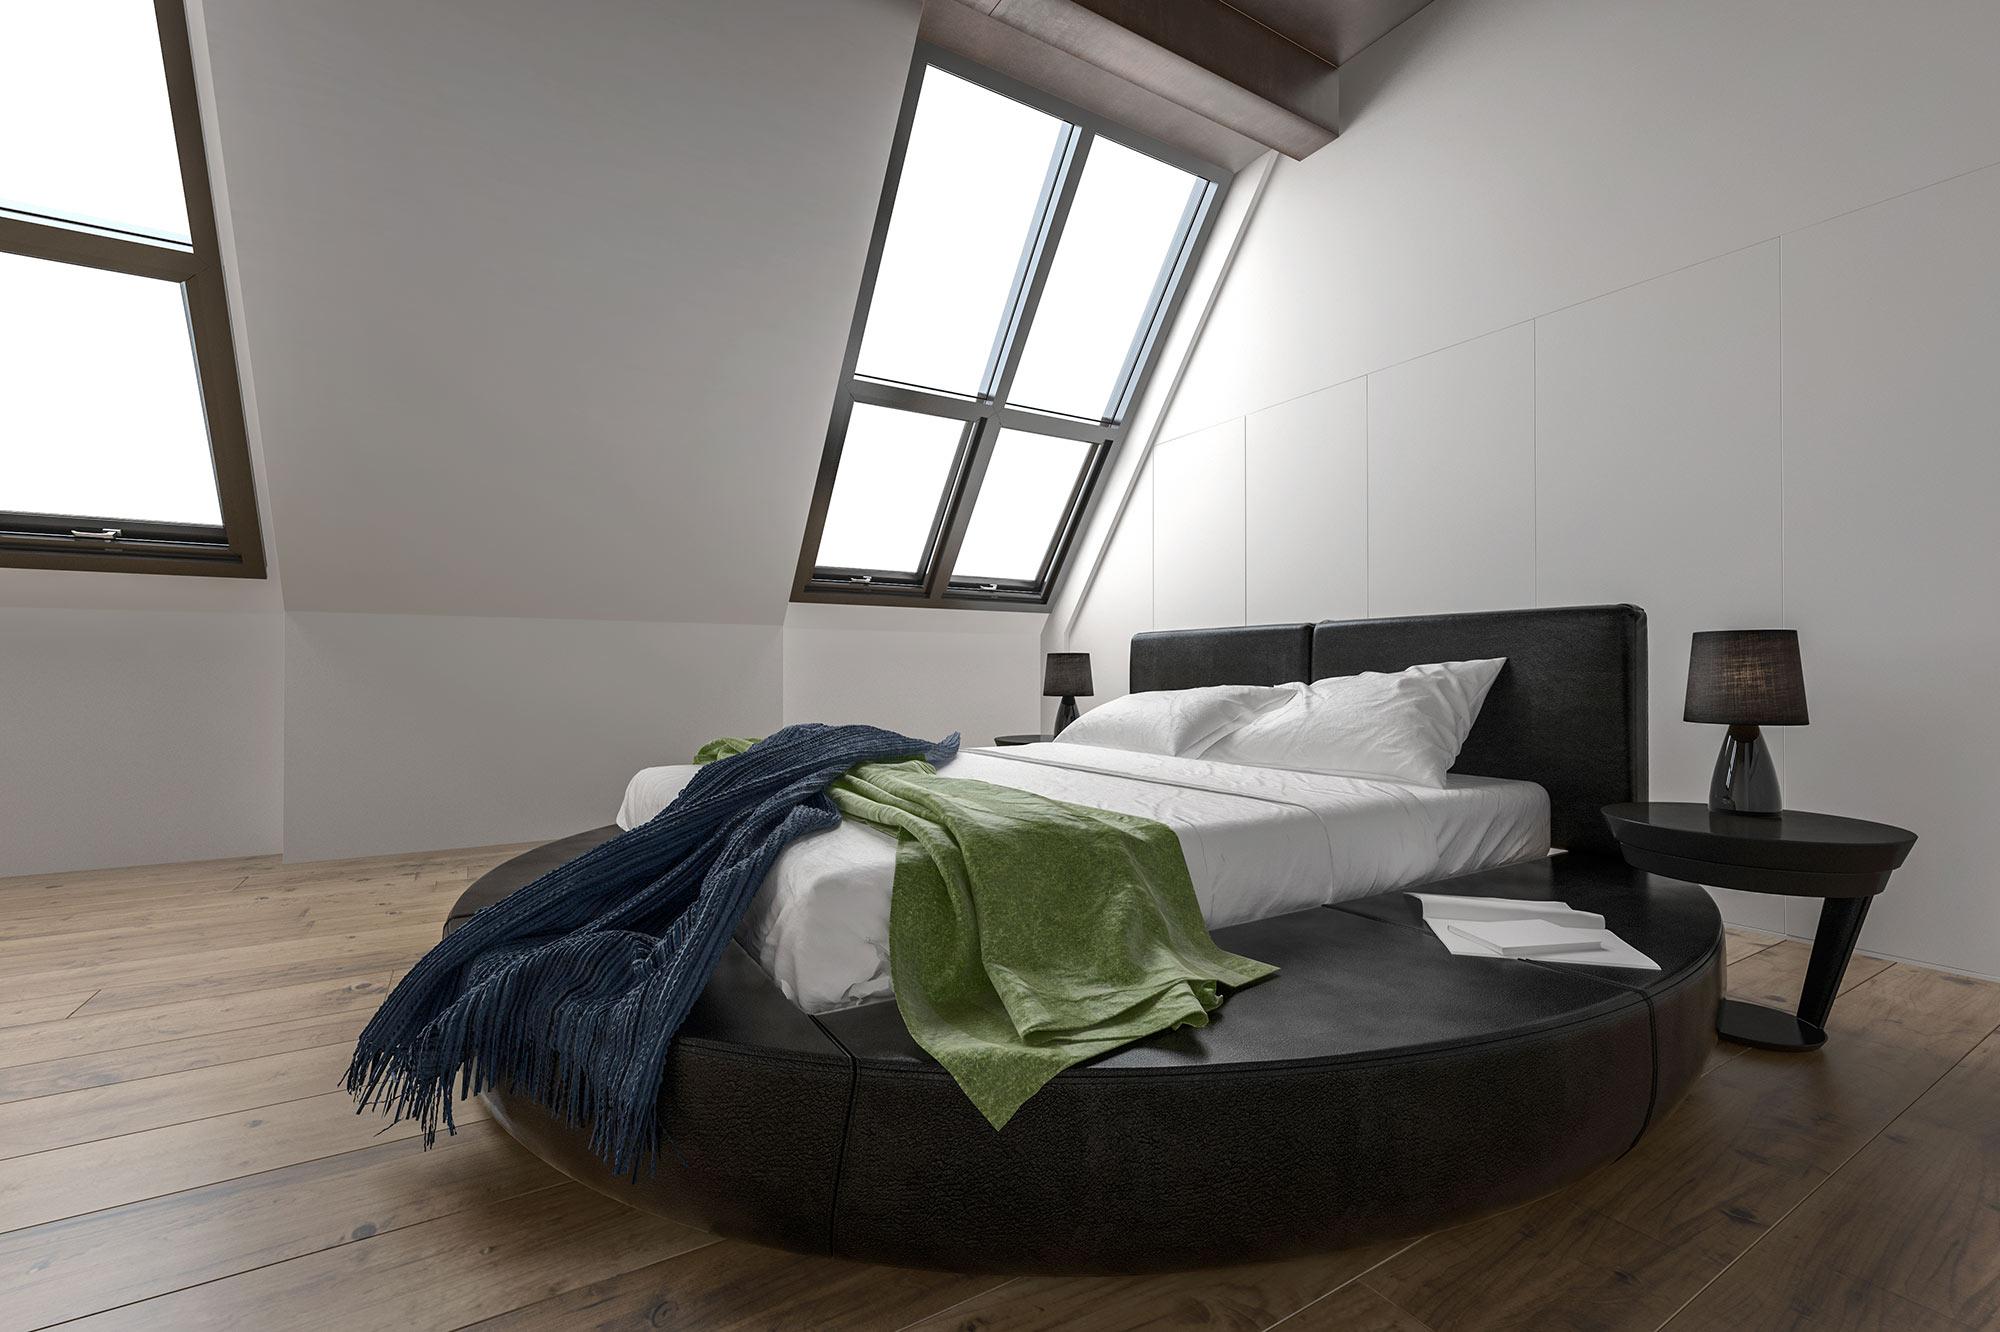 attic conversion rendering